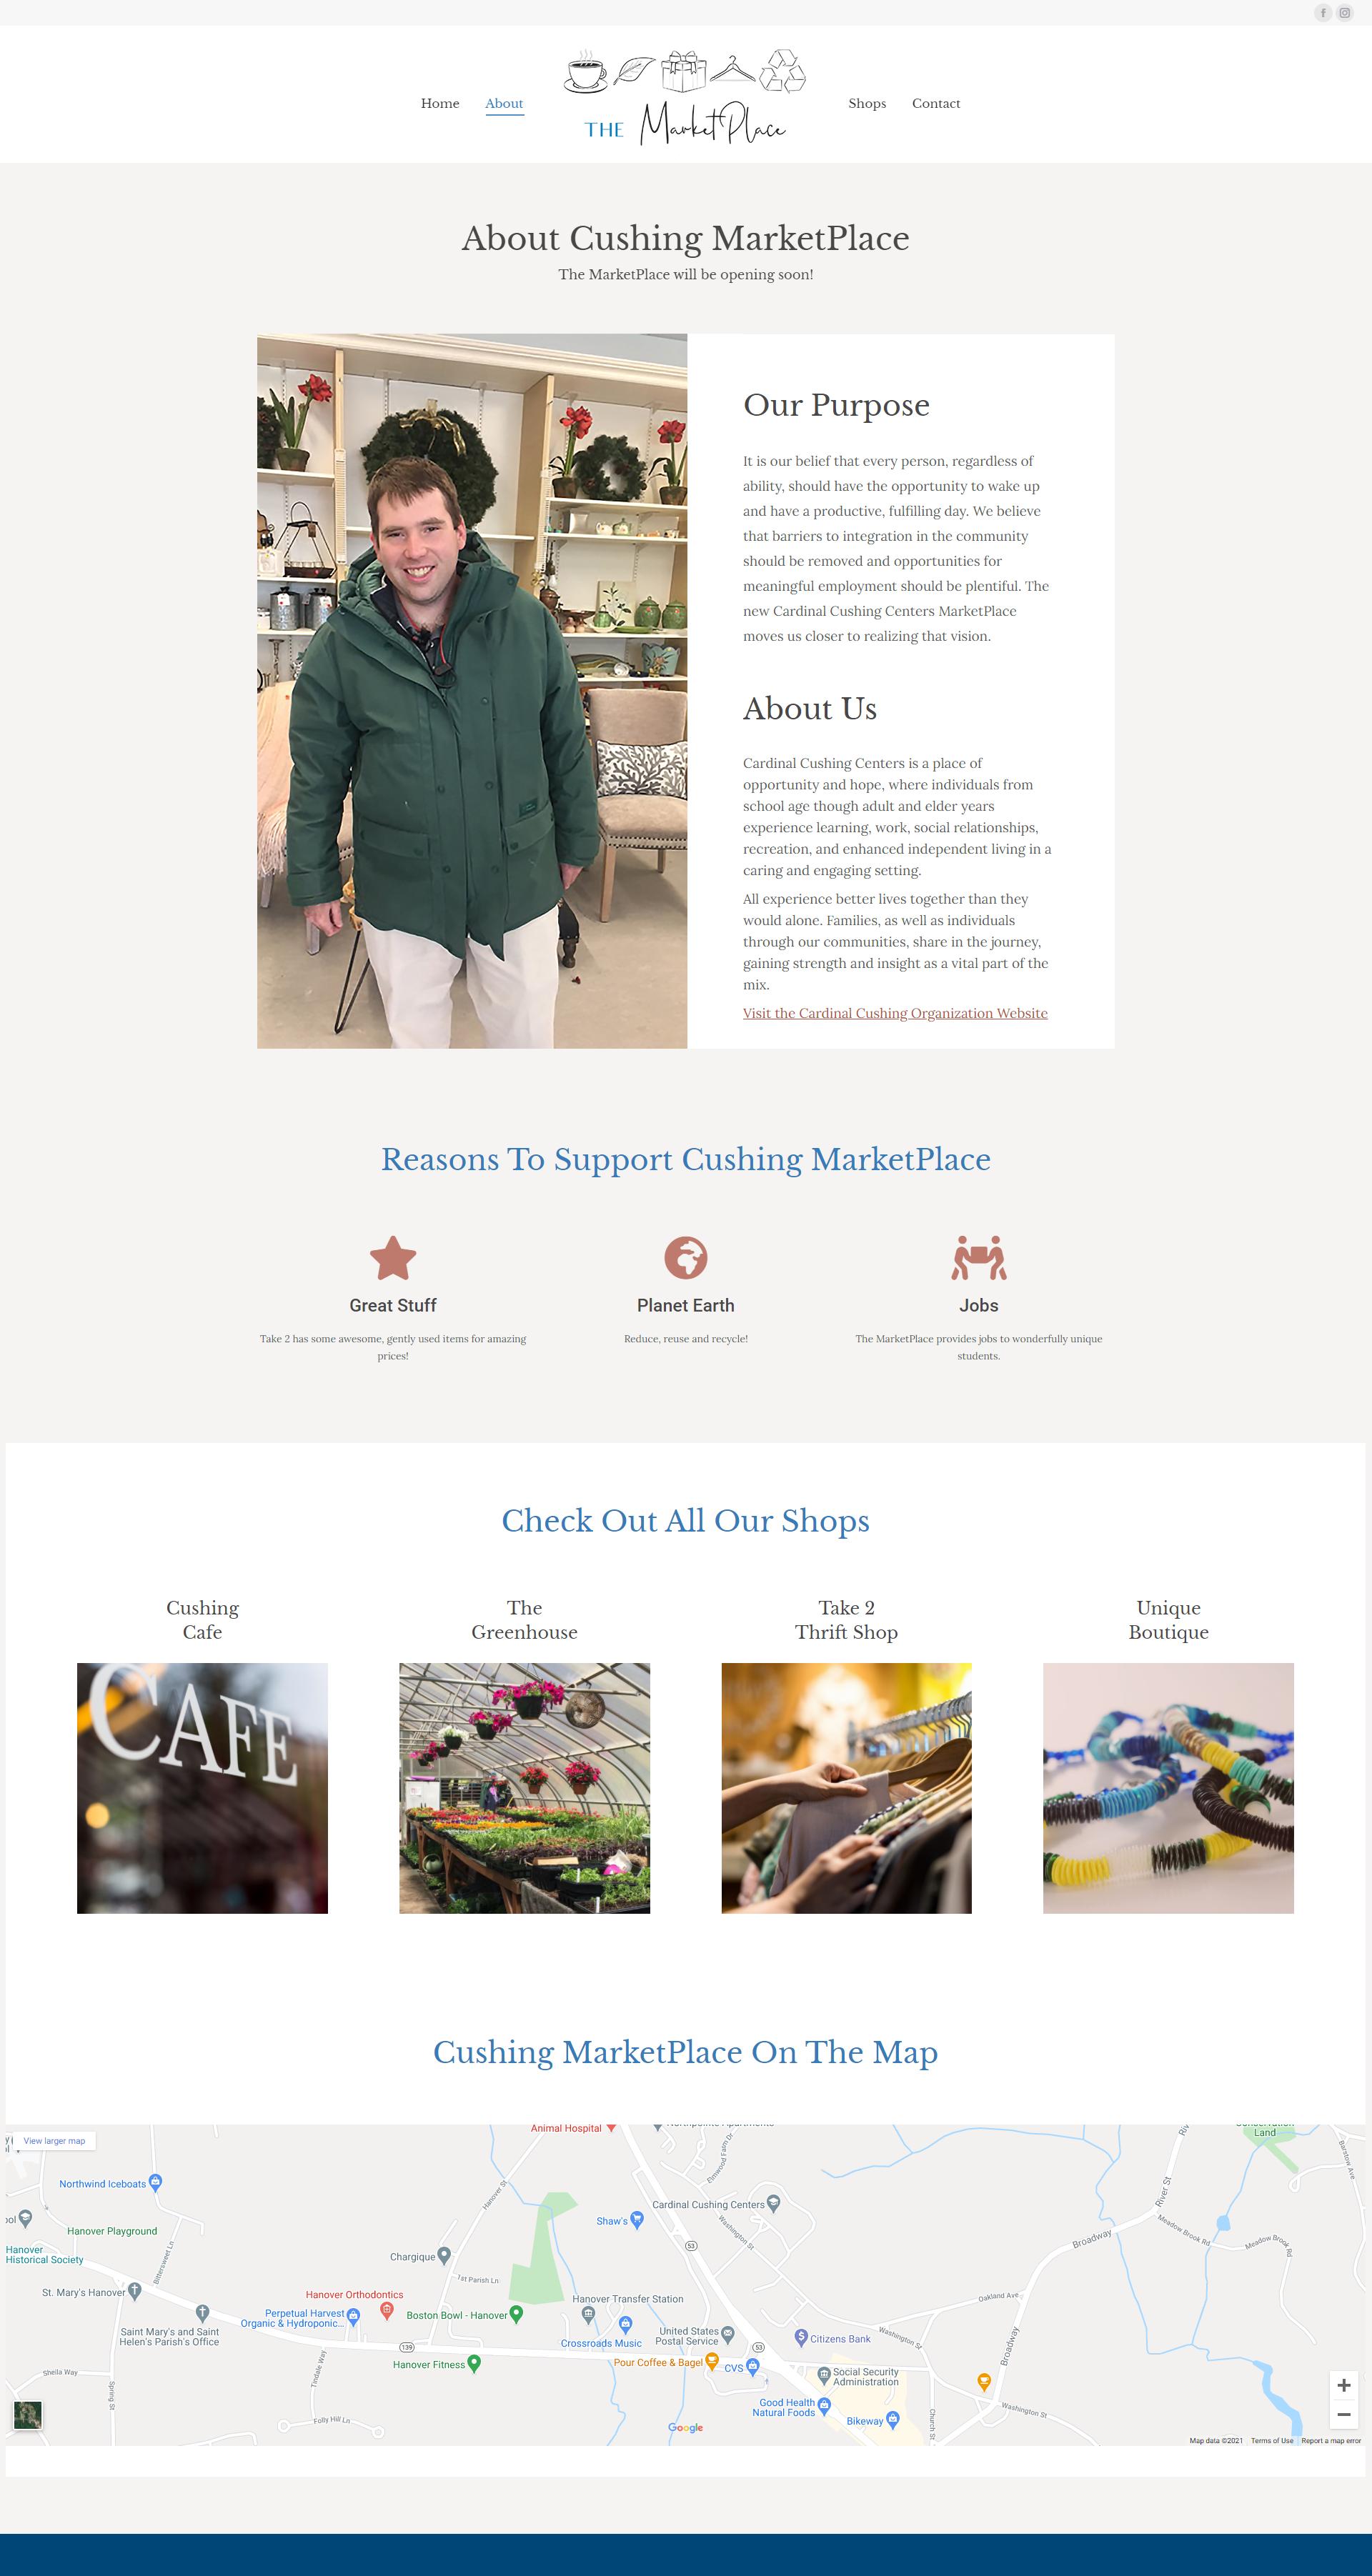 Cushing MarketPlace website screenshot